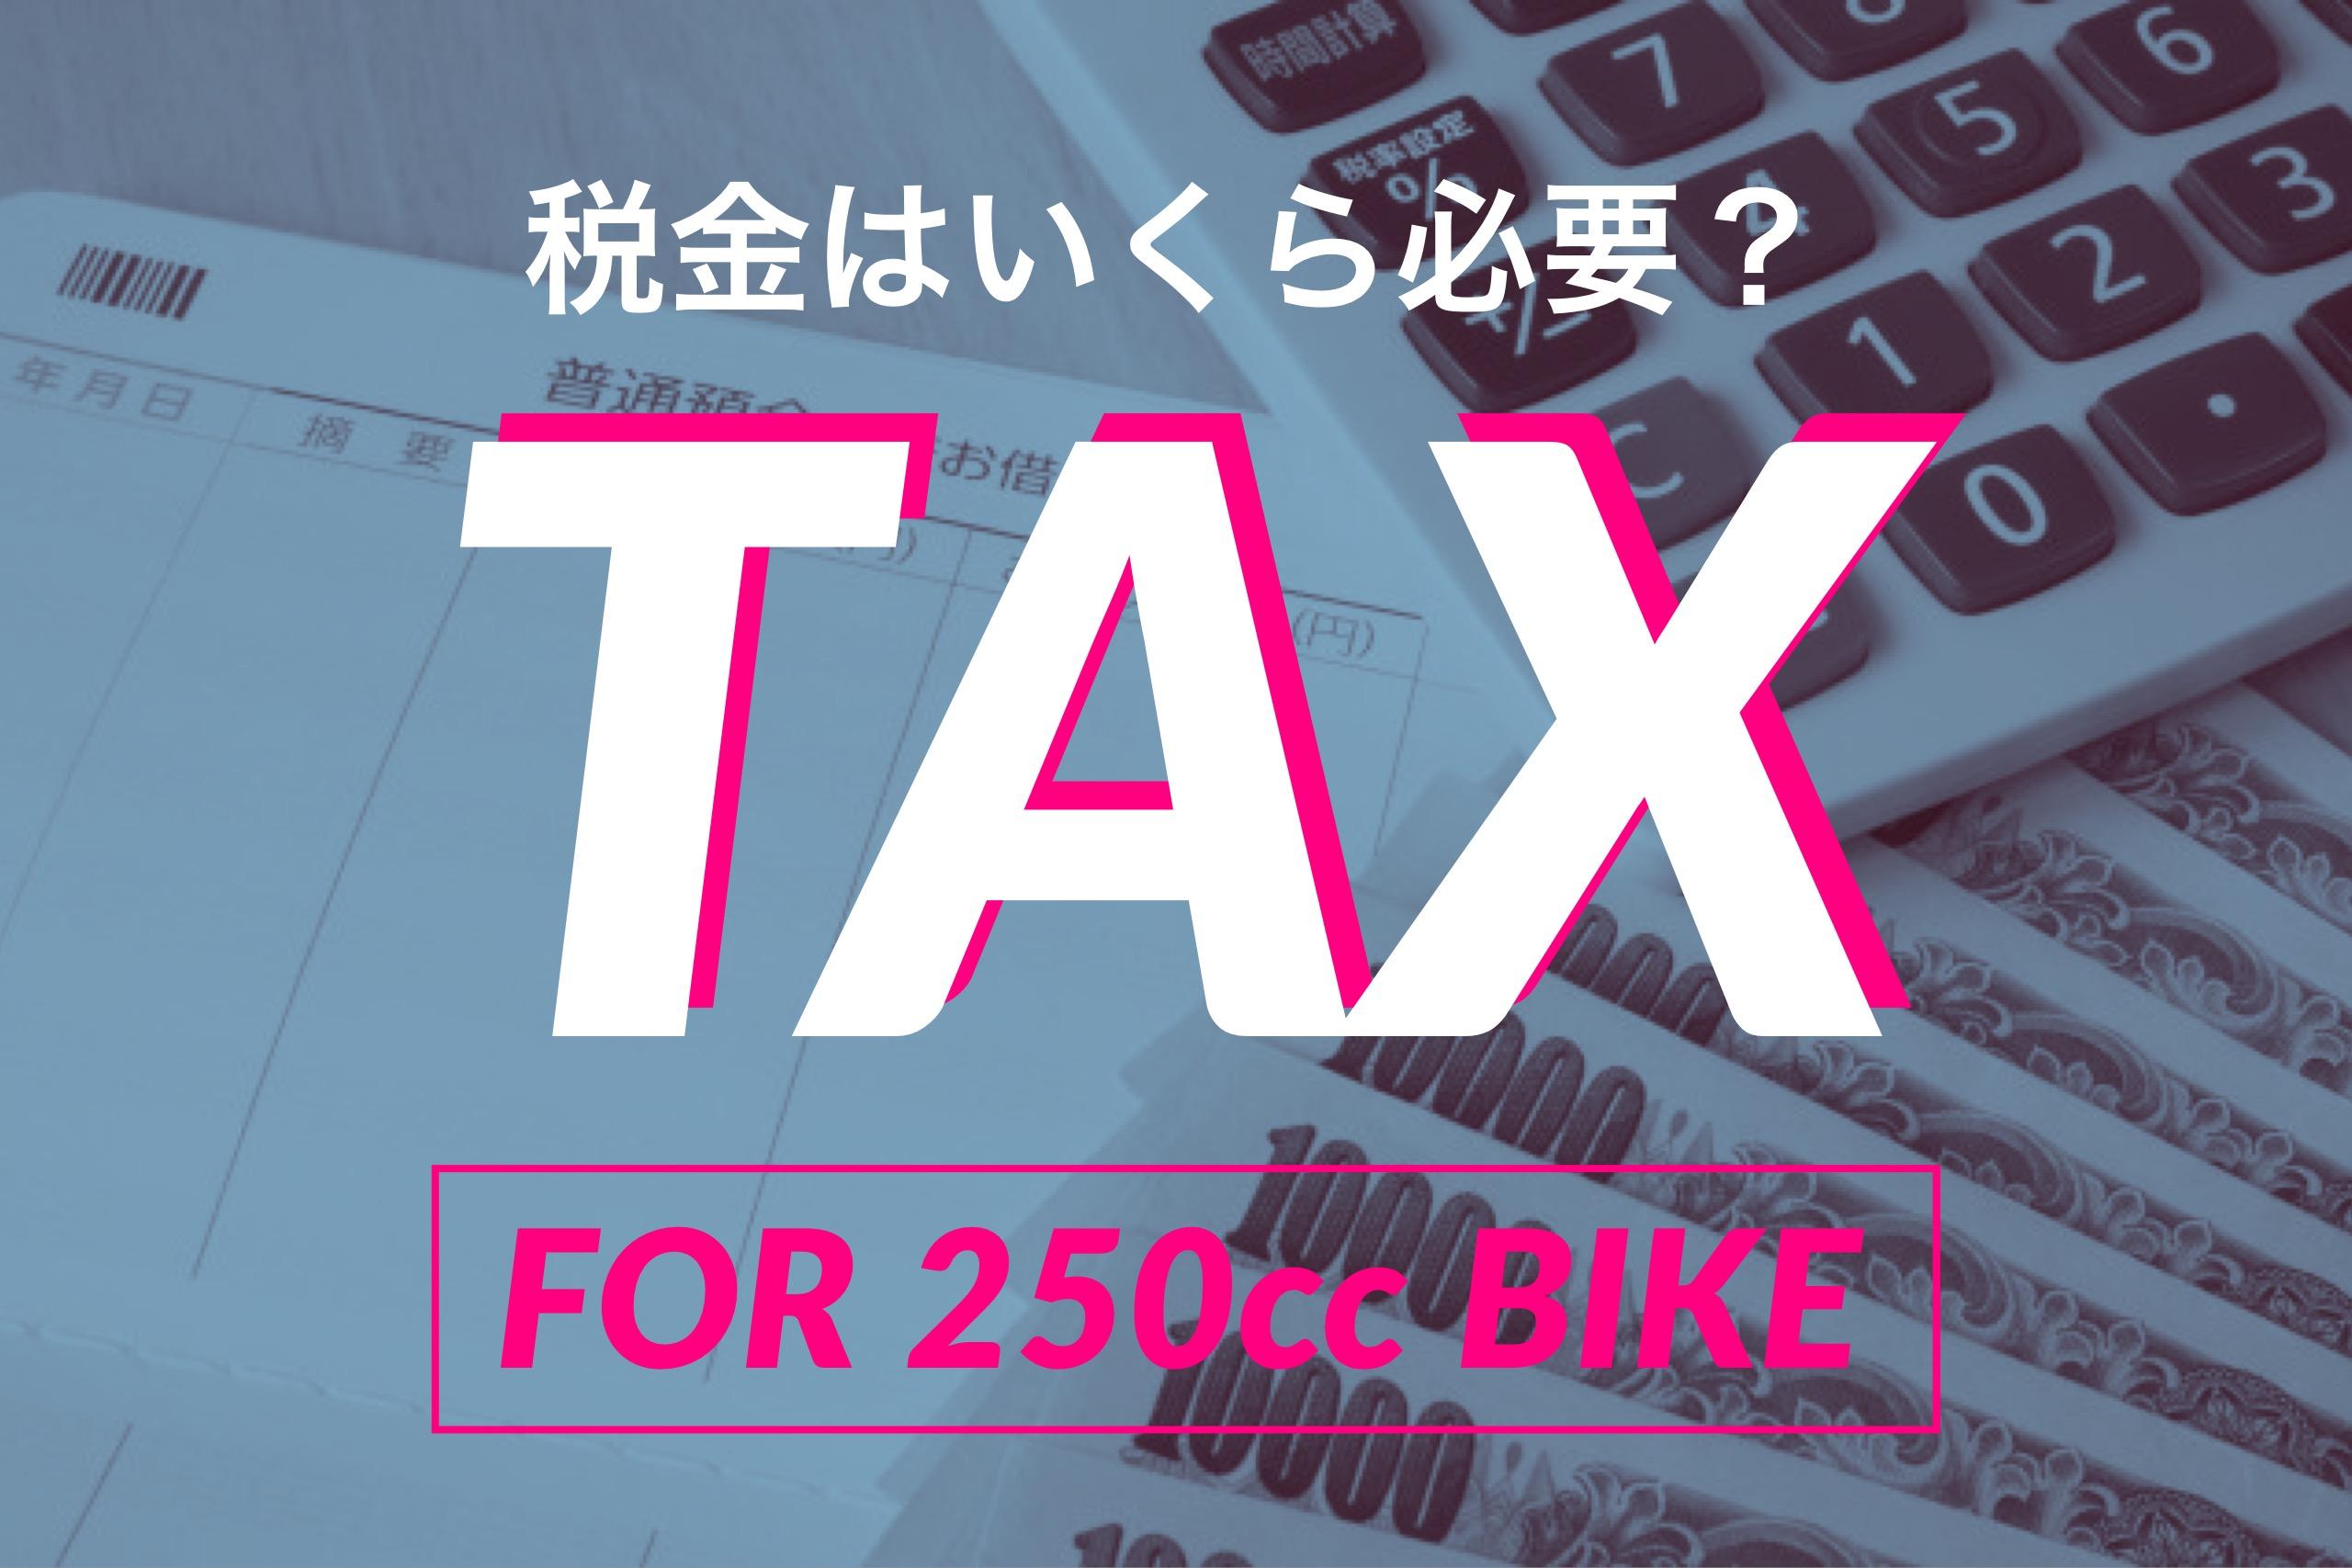 250ccバイクに必要な税金まとめ【2019年8月】